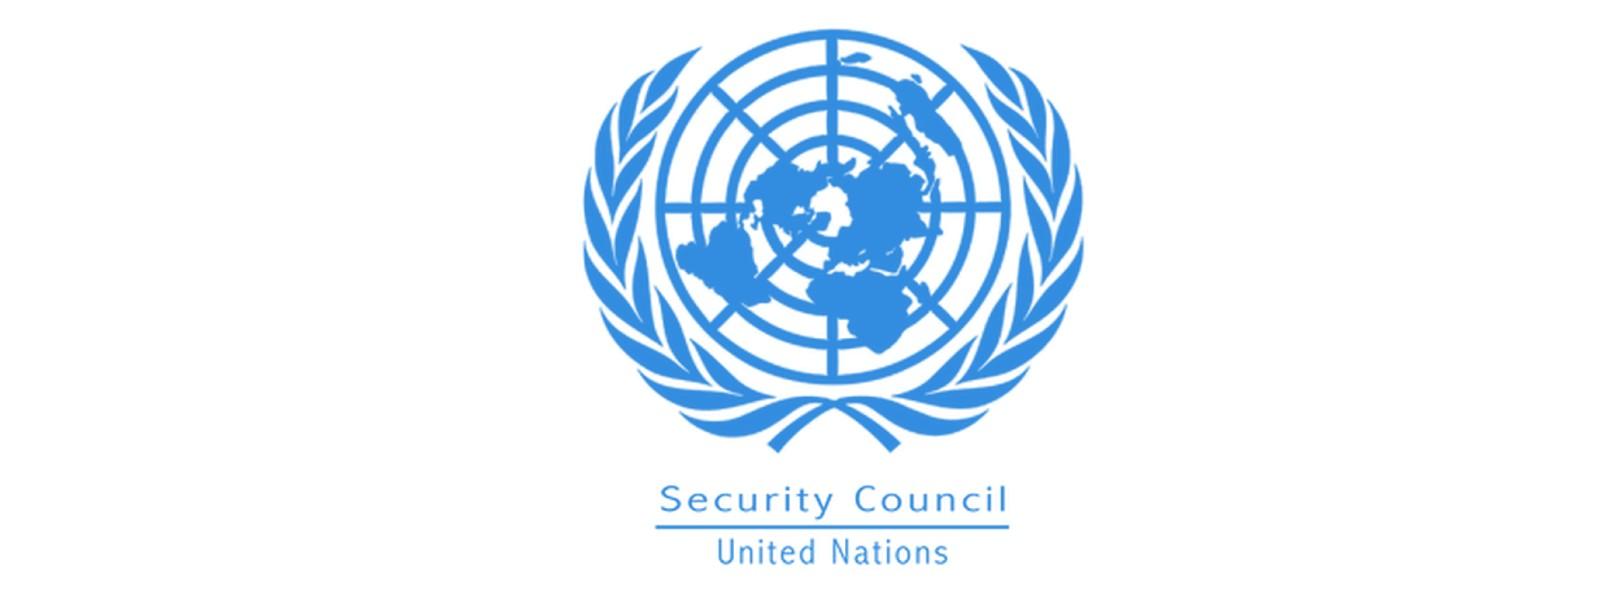 China backs UN Security Council calling Myanmar to return to civilian rule